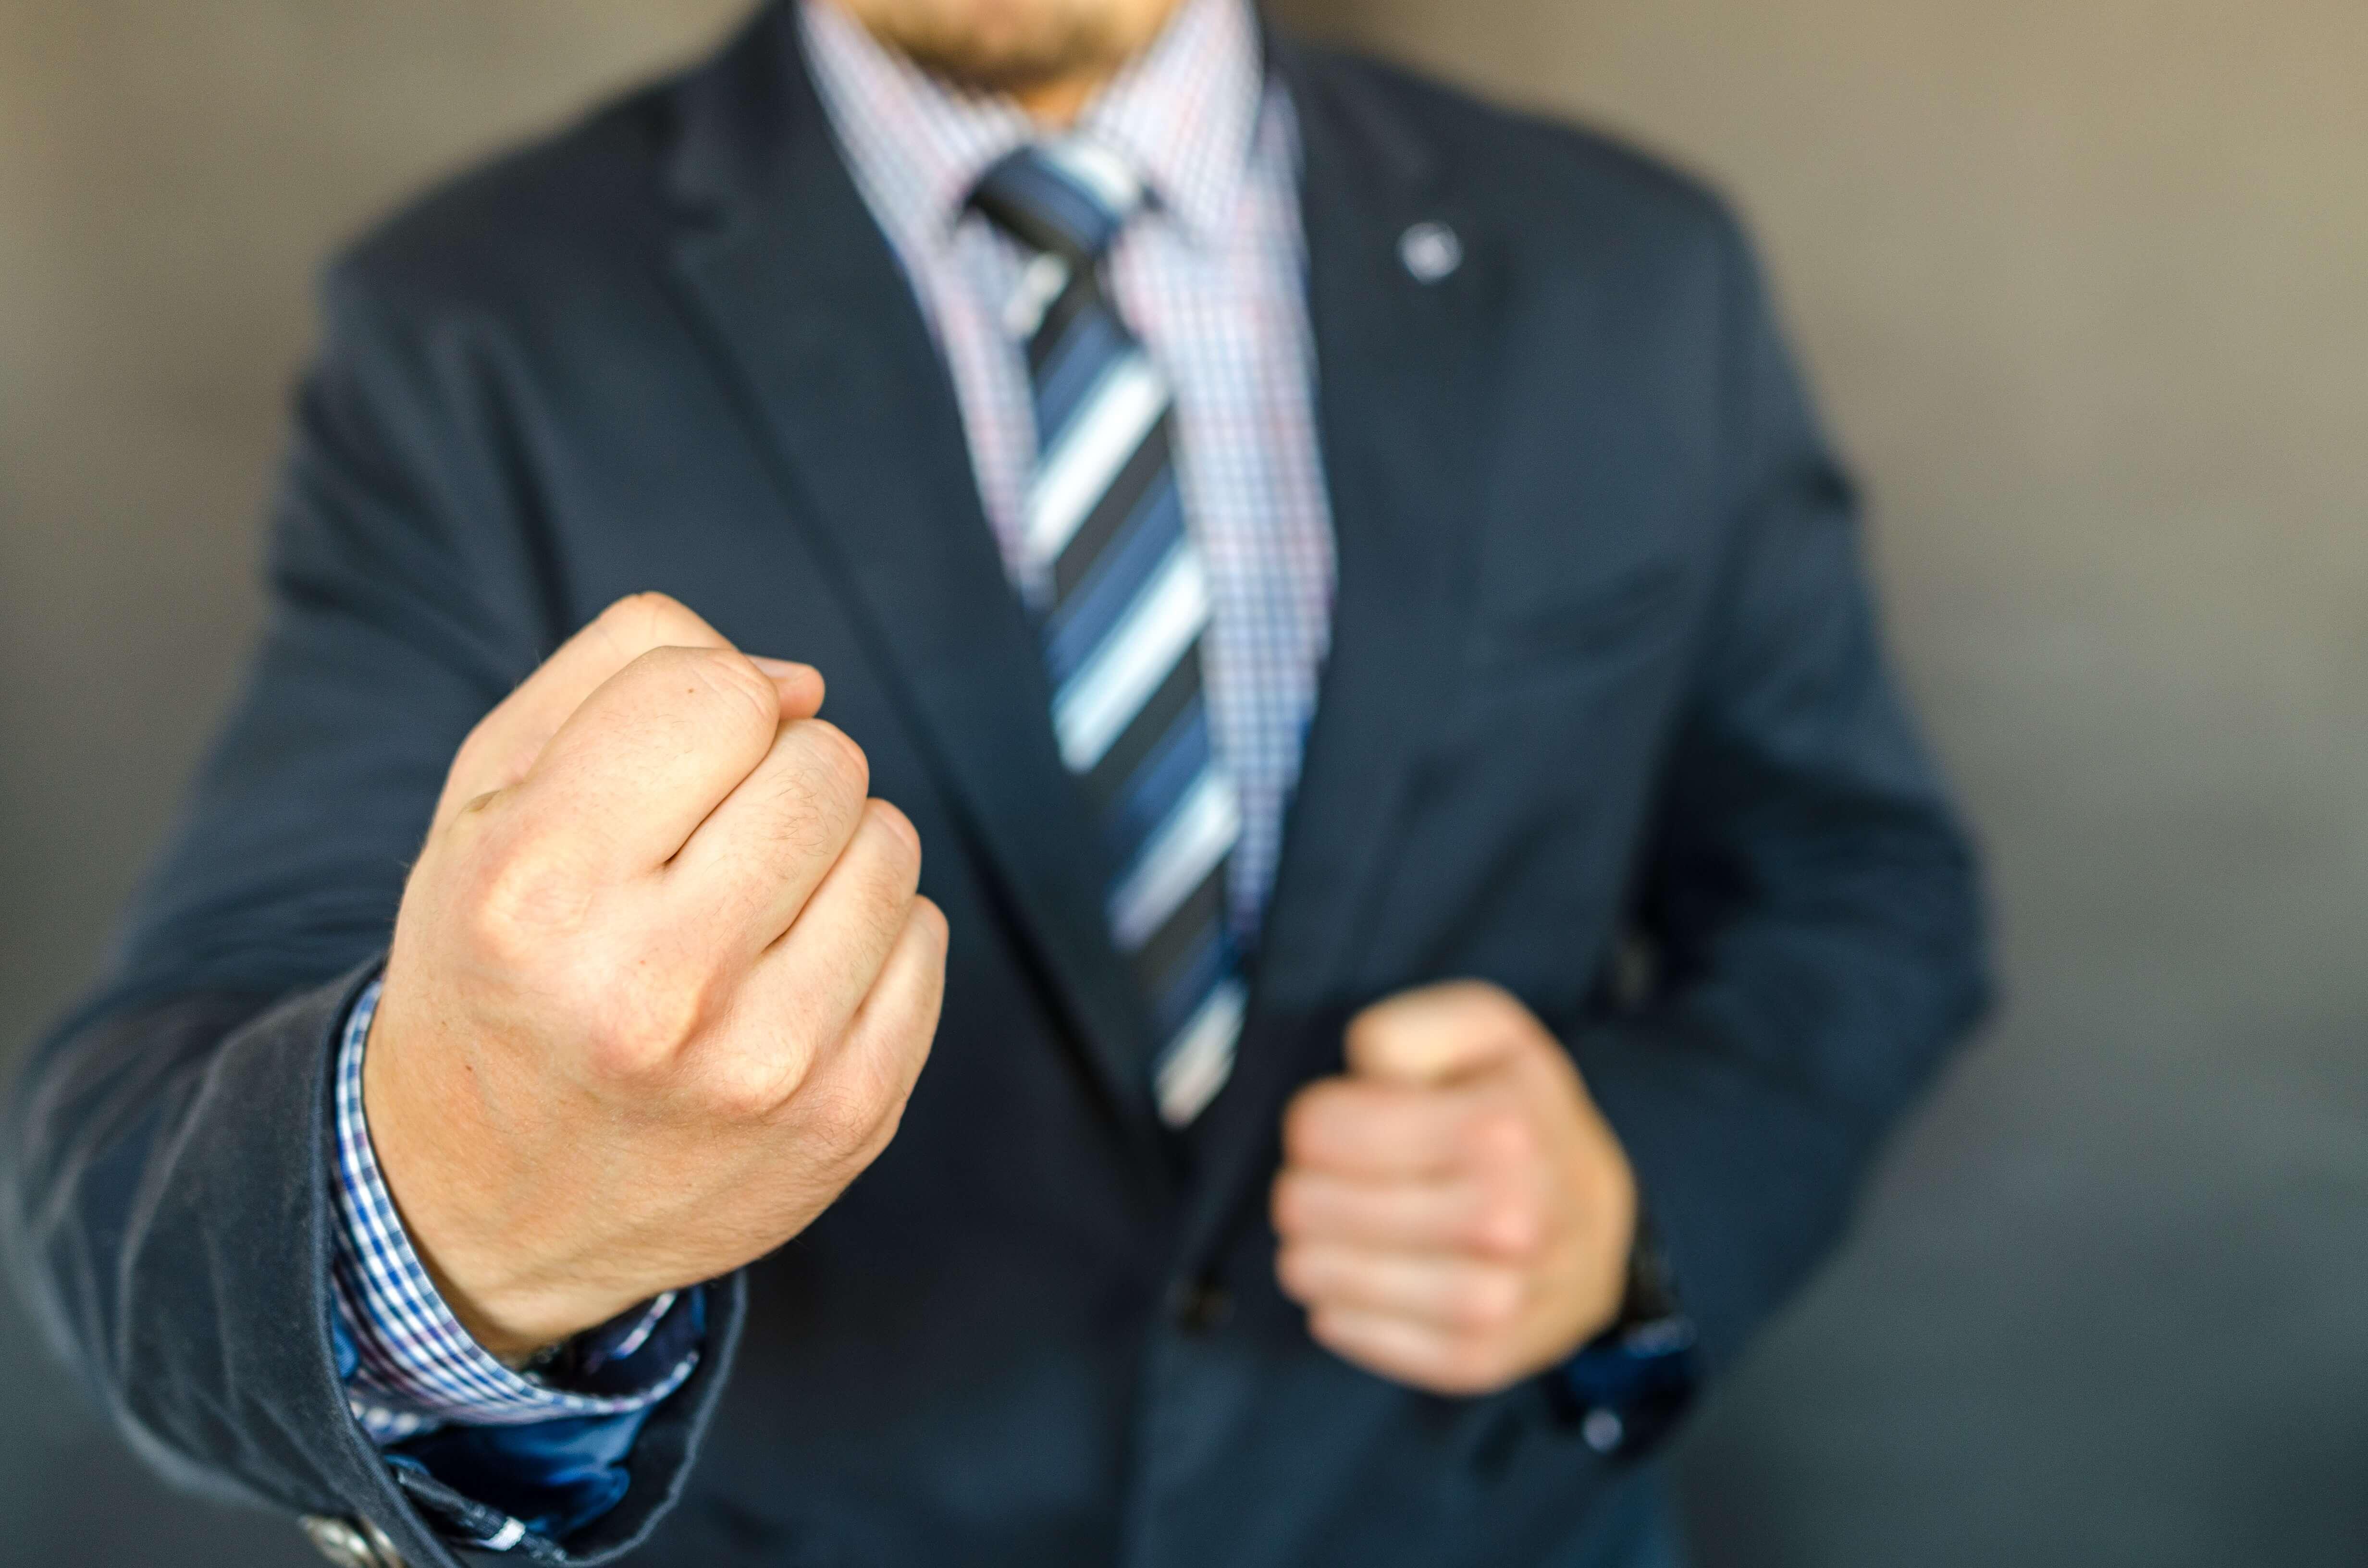 man clenching his fist forward